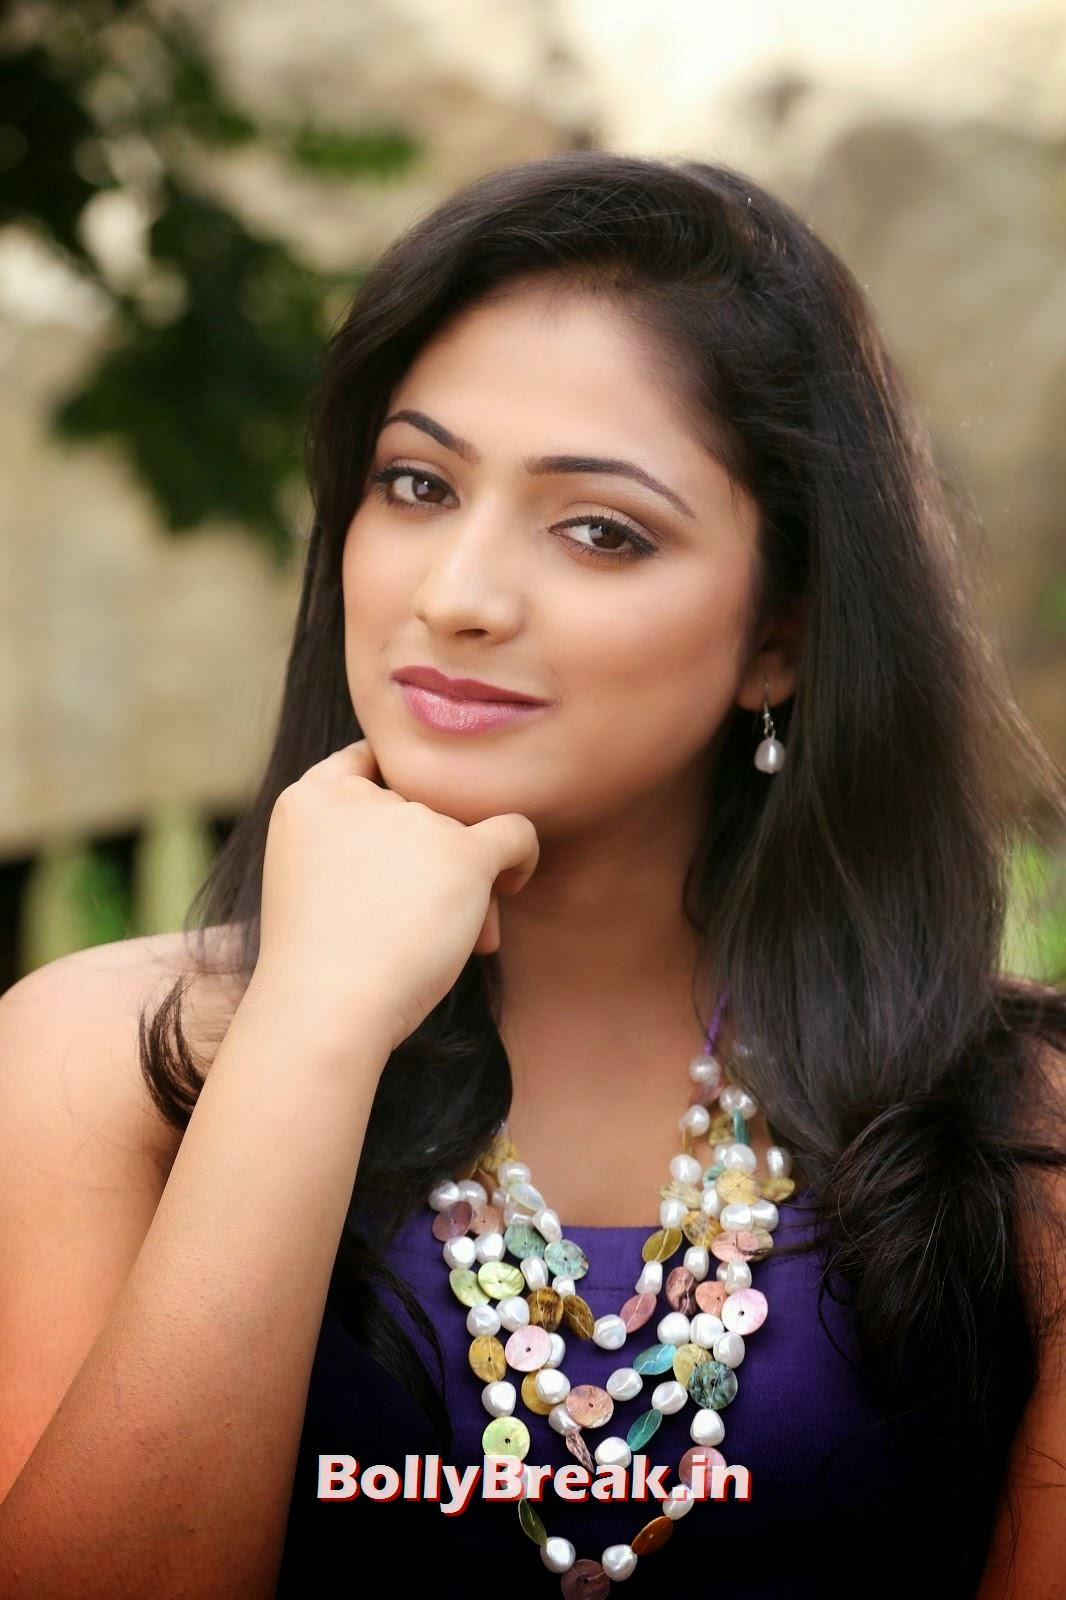 , Haripriya Latest Hot Images 2014 - Hot Photoshoot Pics